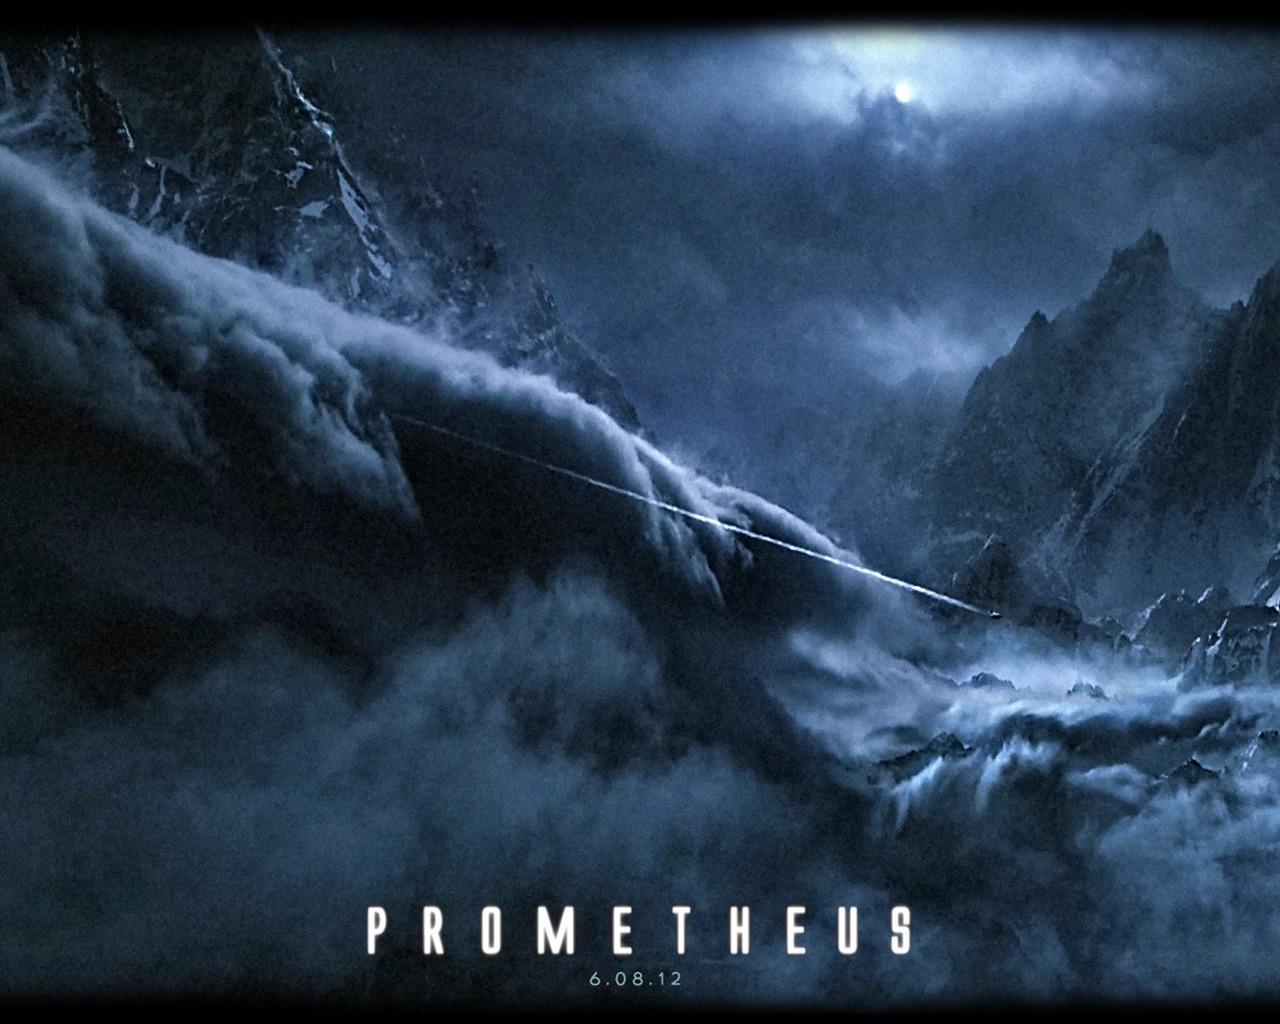 prometheus wallpaper 1366x768